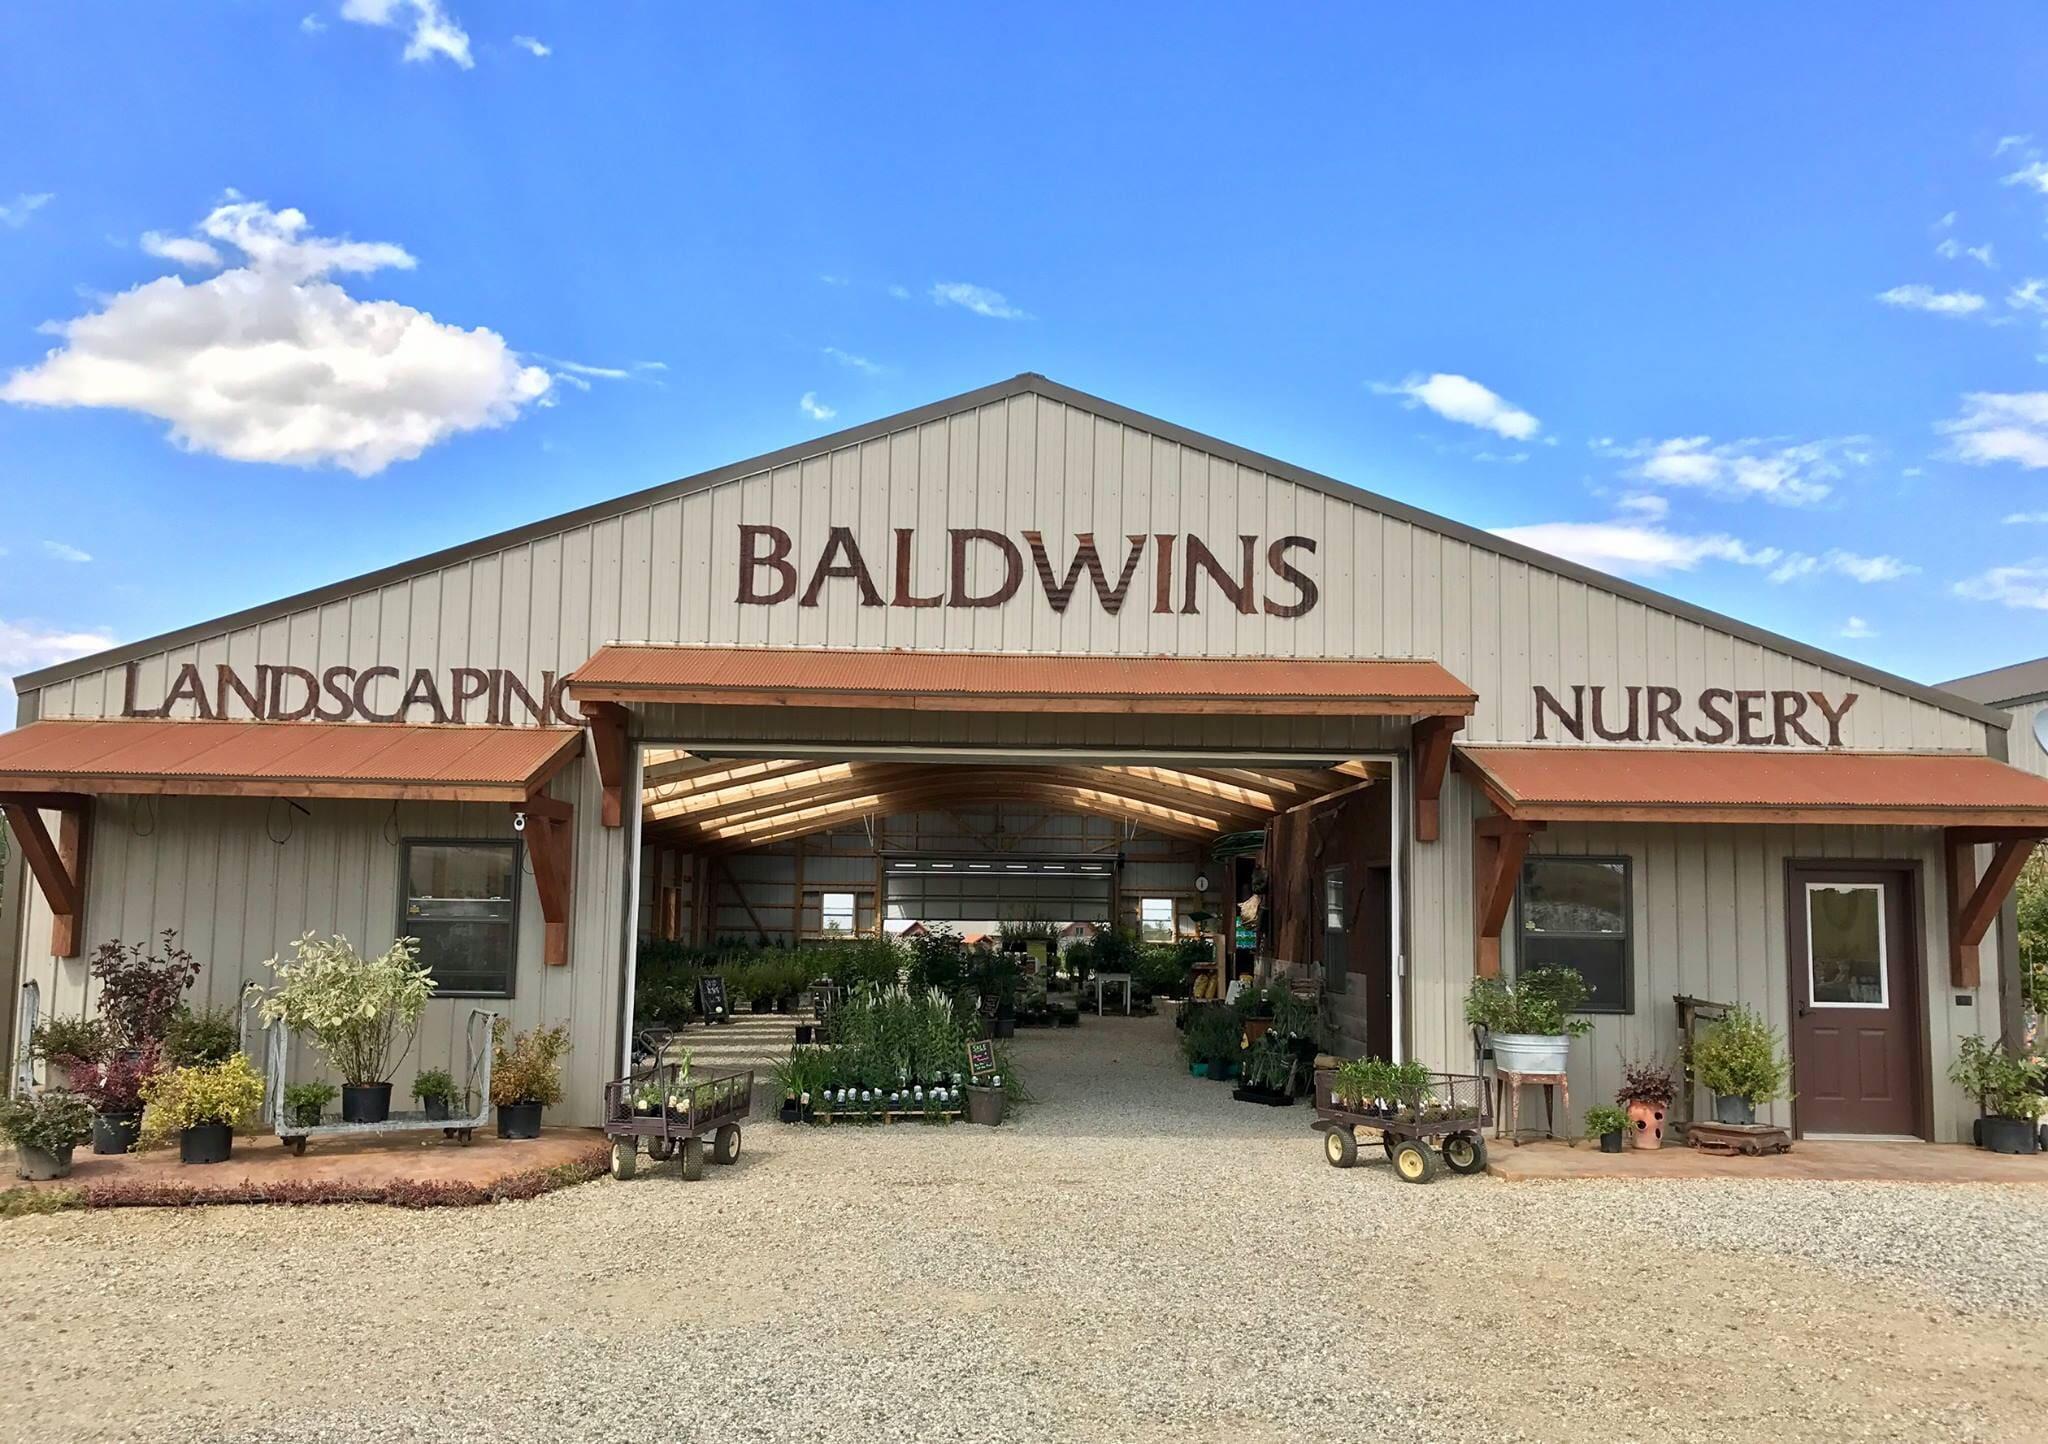 Baldwin's Customized Landscaping image 1